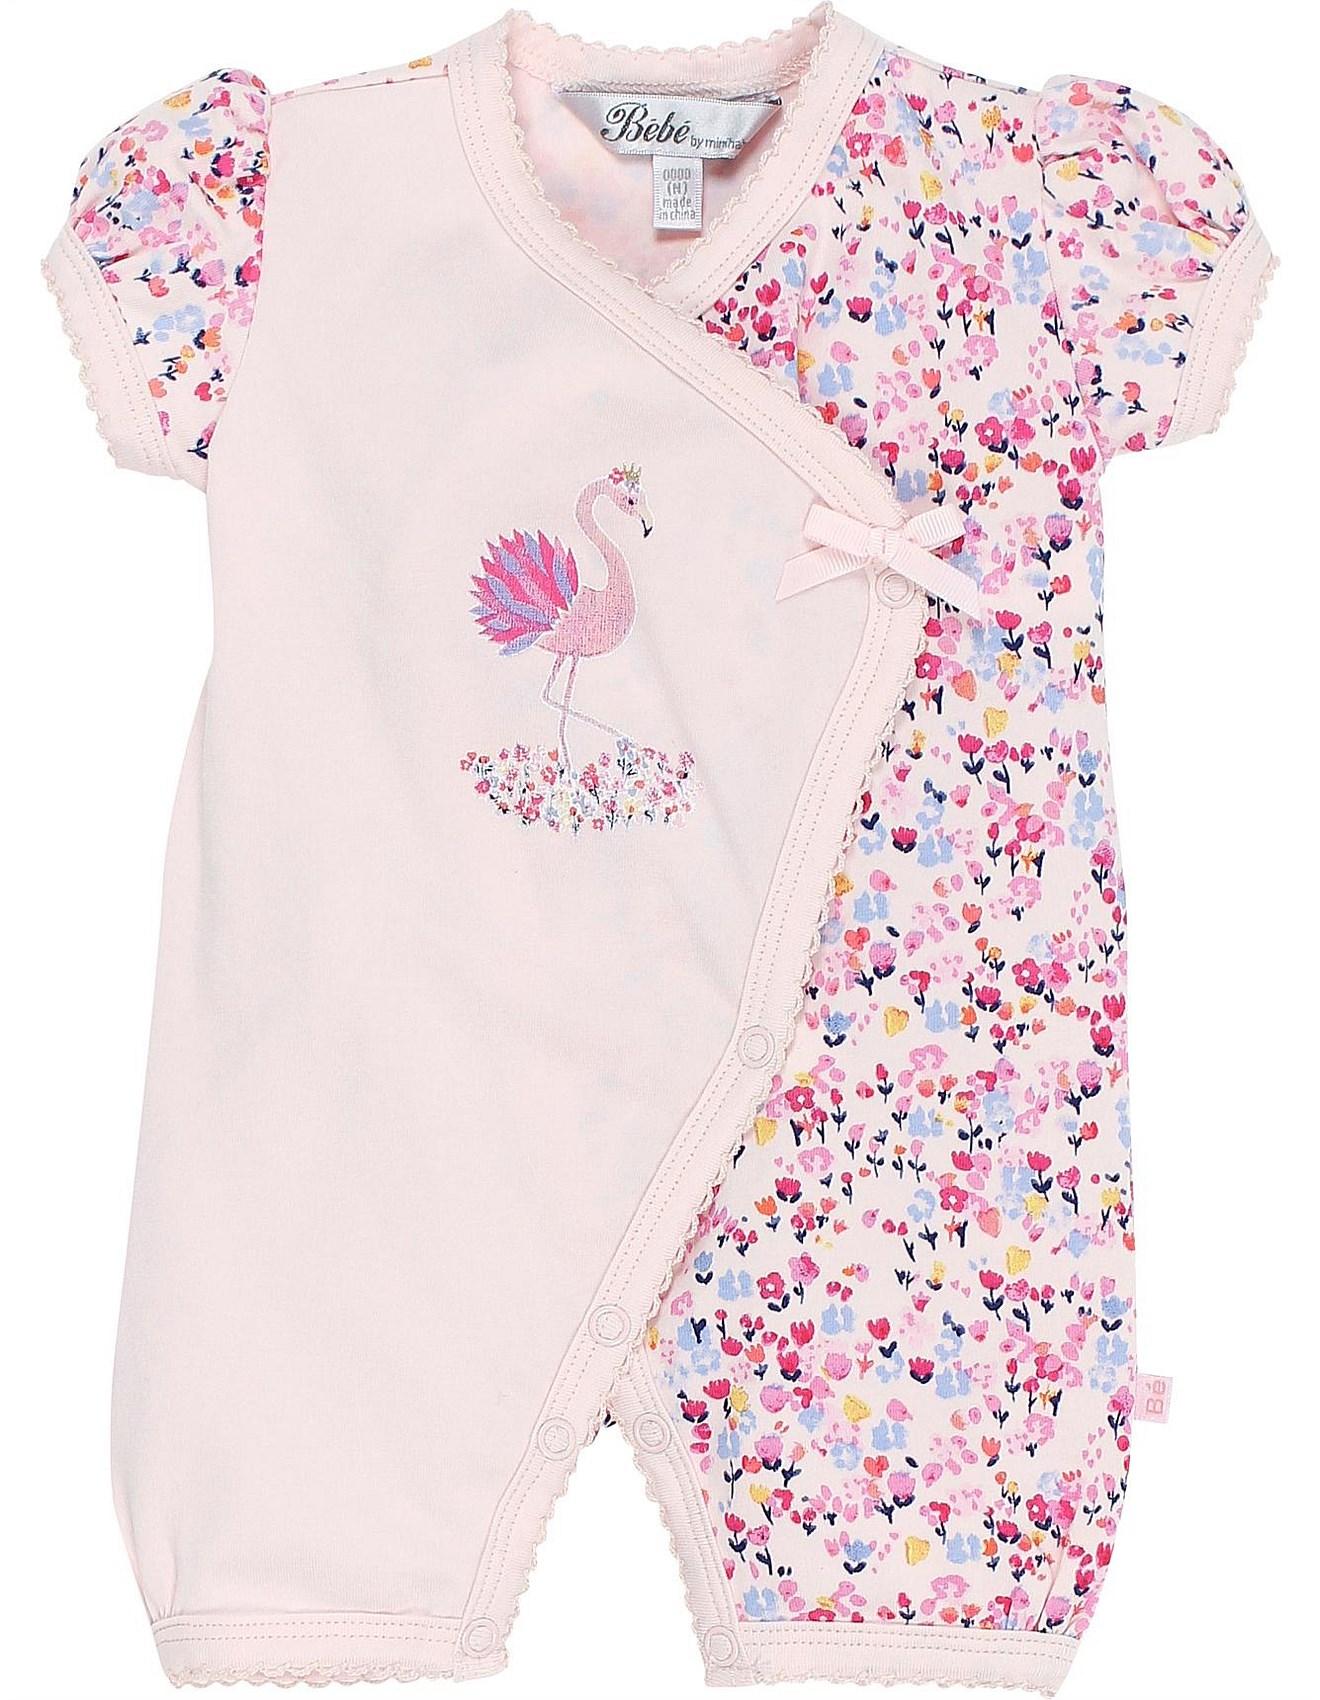 9b34a273b55 Baby Clothing